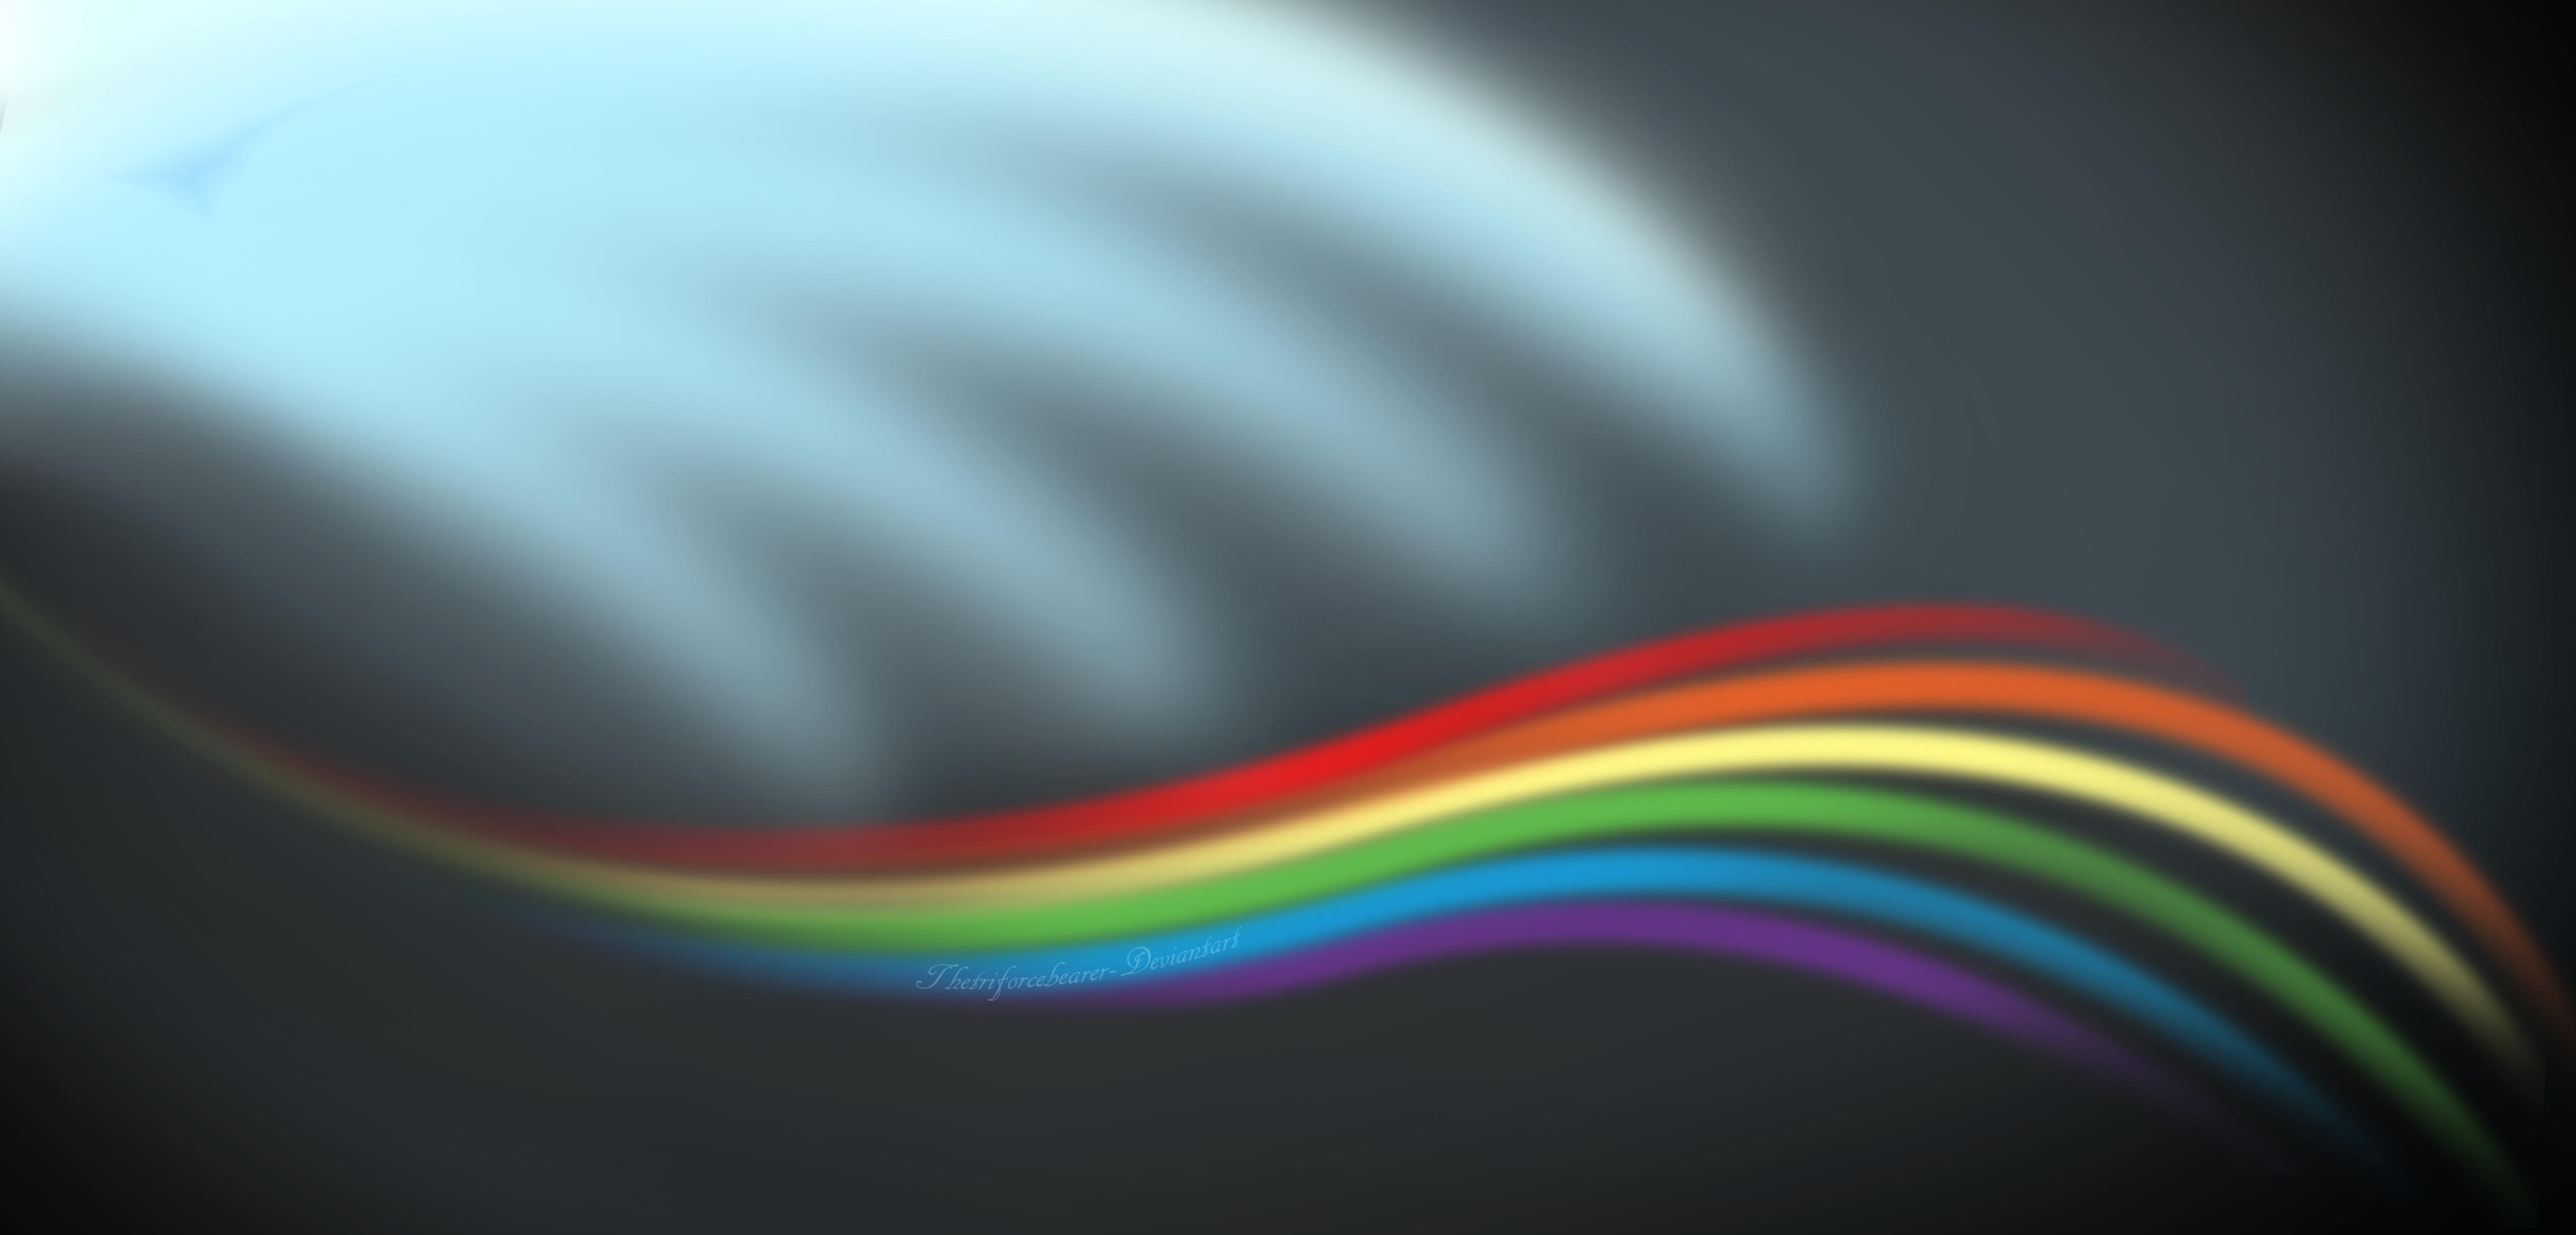 Rainbow Dash Wallpaper by Digital-Quill-Studio